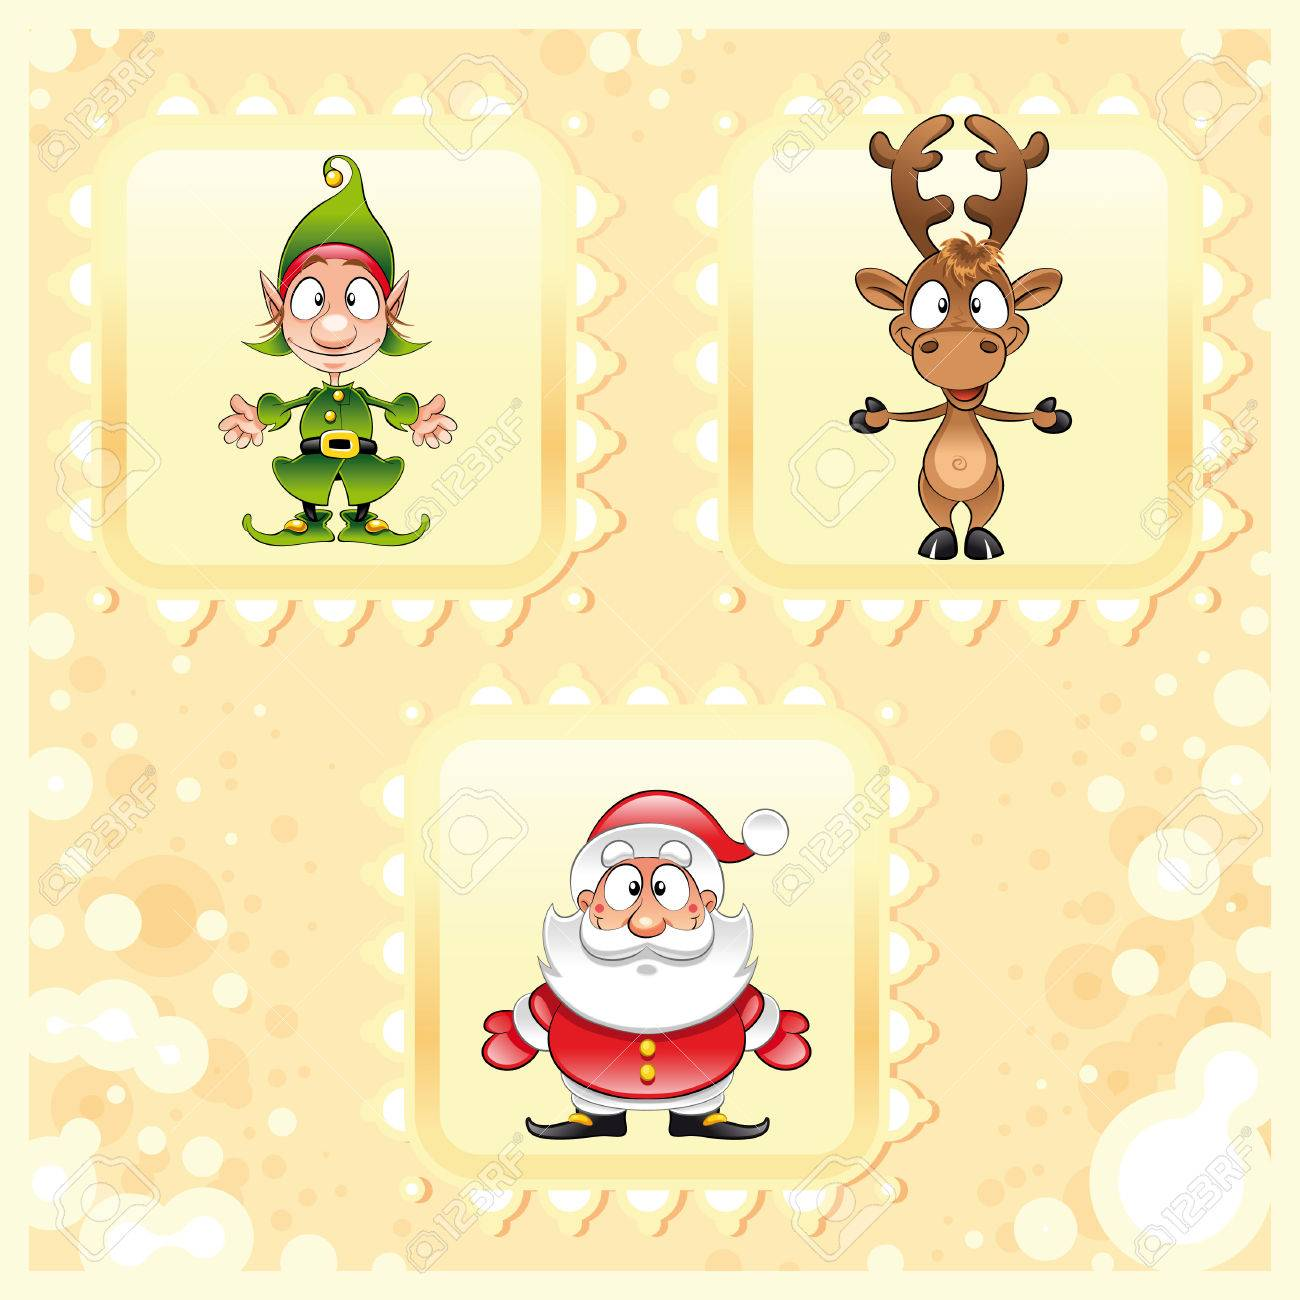 SantaClaus, Rudolph and Elf, cartoon and vector illustration Stock Vector - 5539133